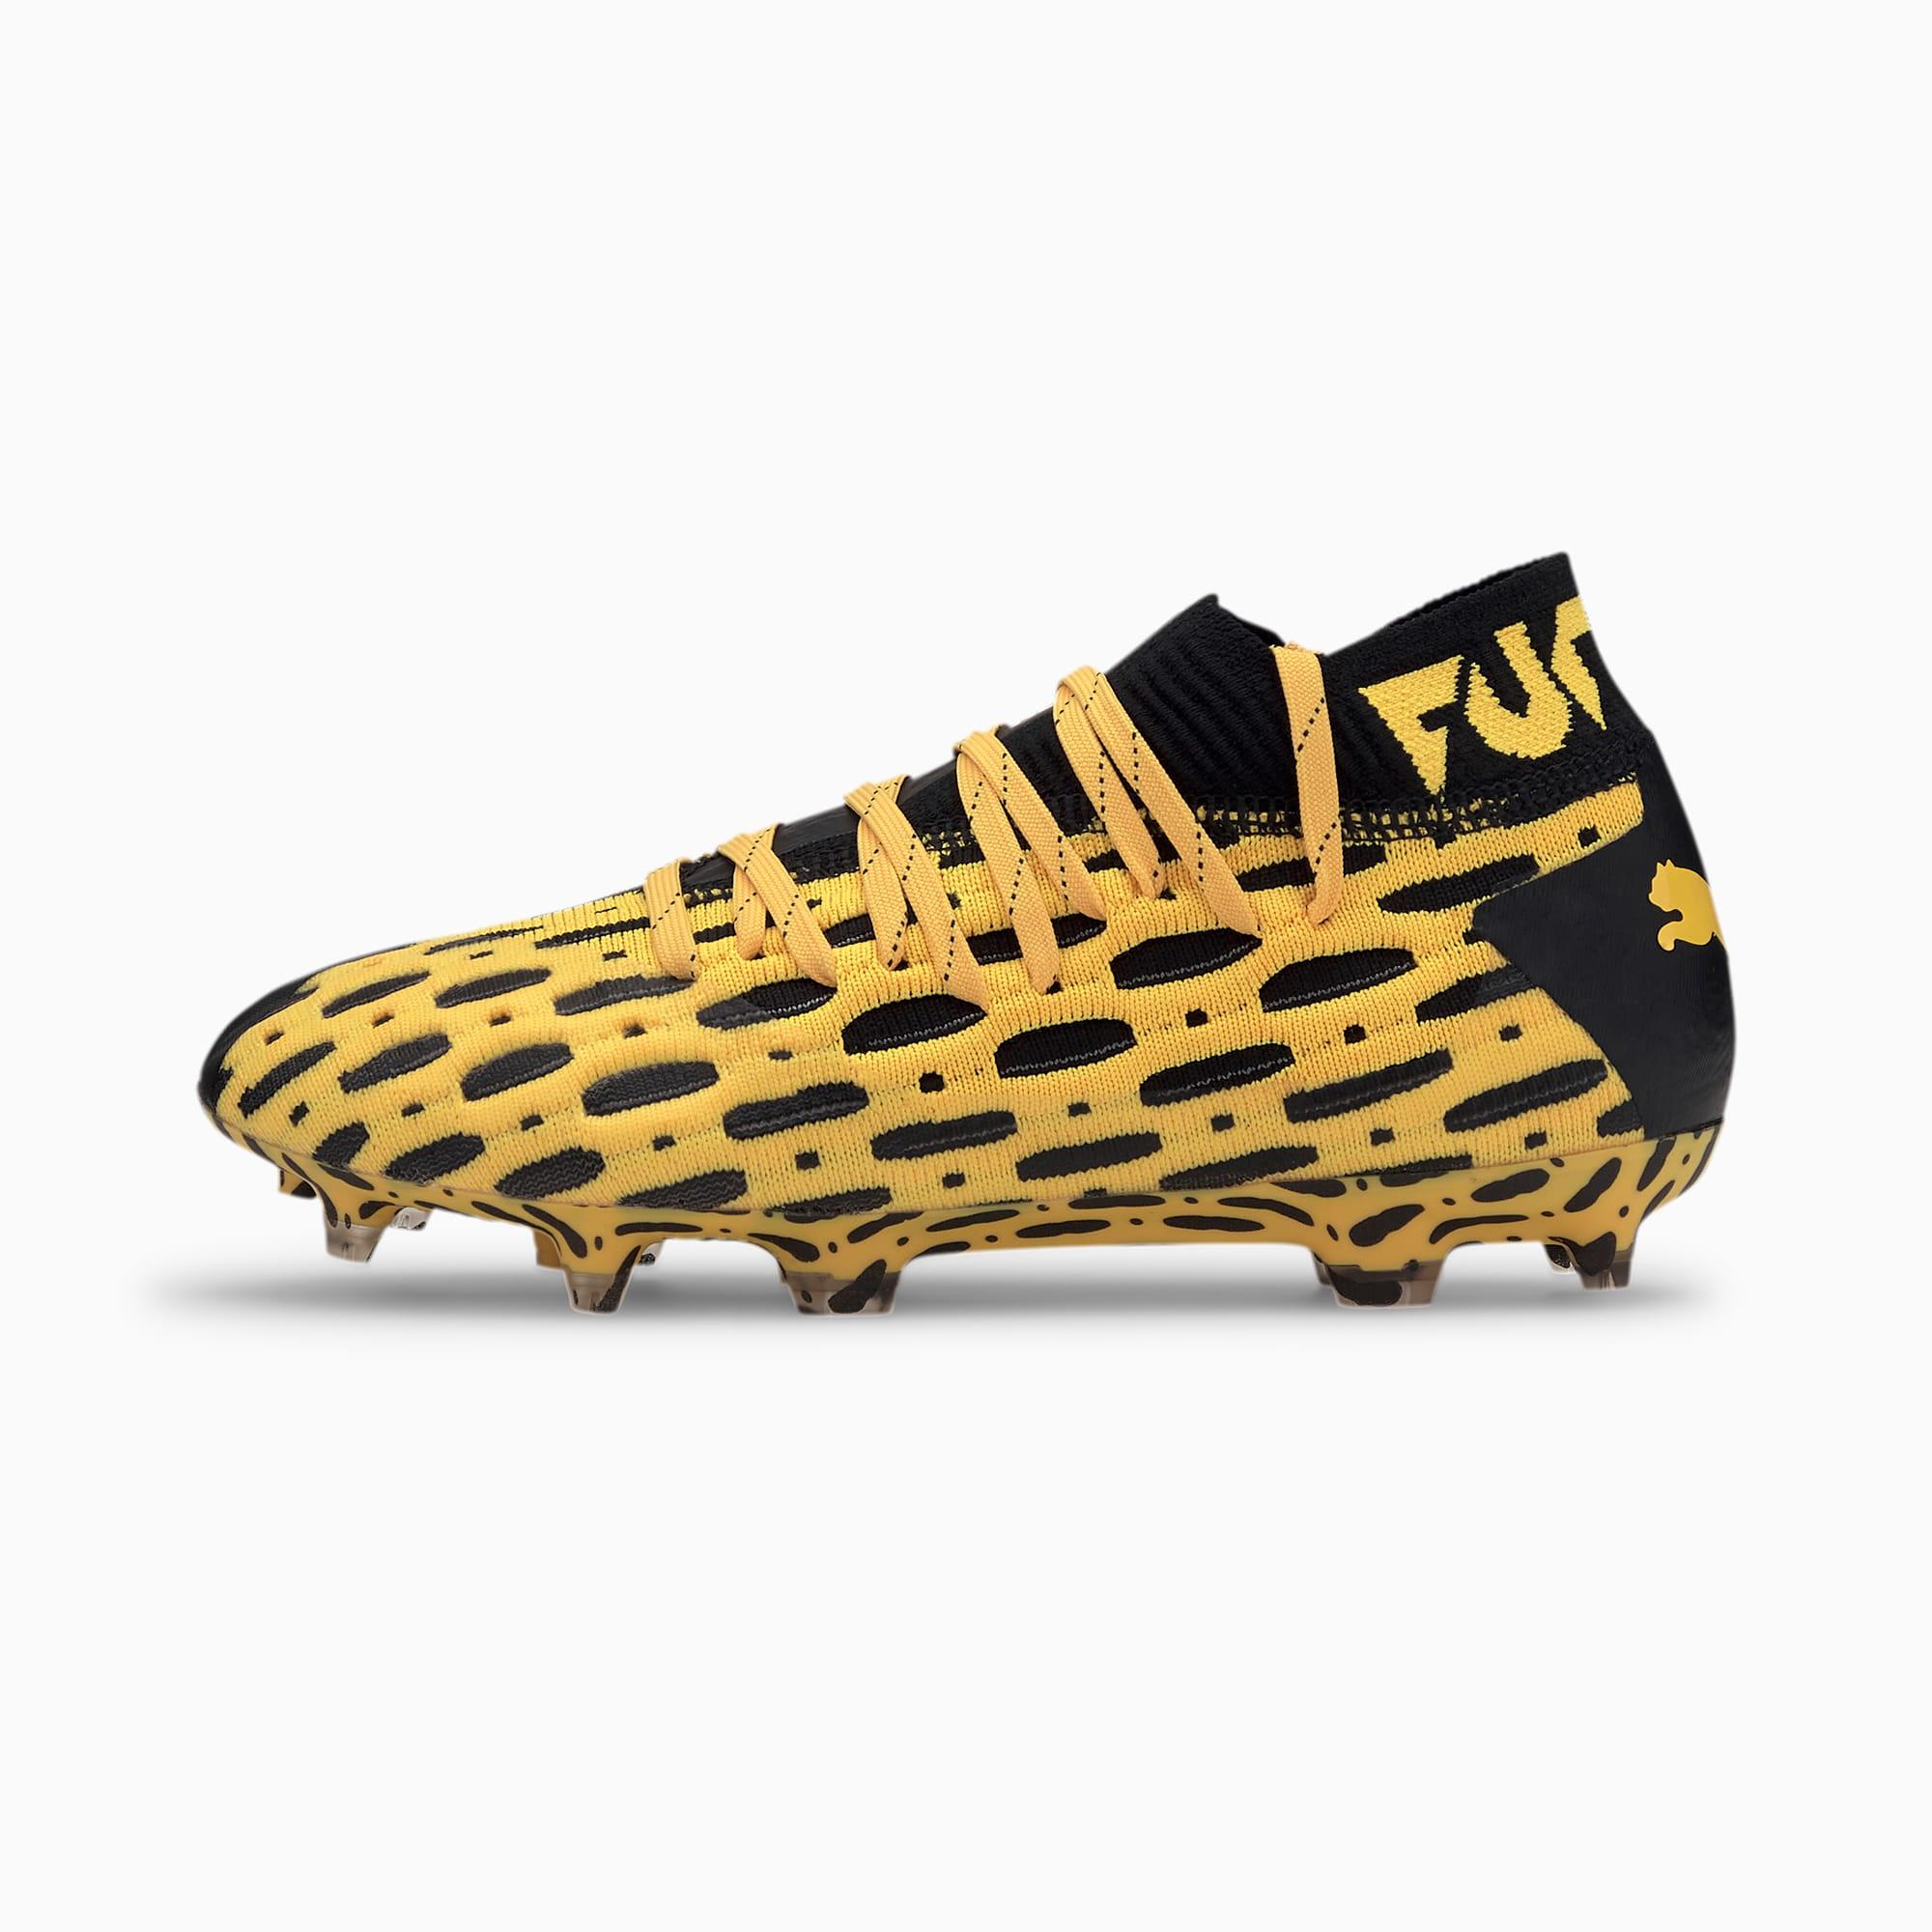 Chaussures foot crampons Puma Future 5.1 Netfit